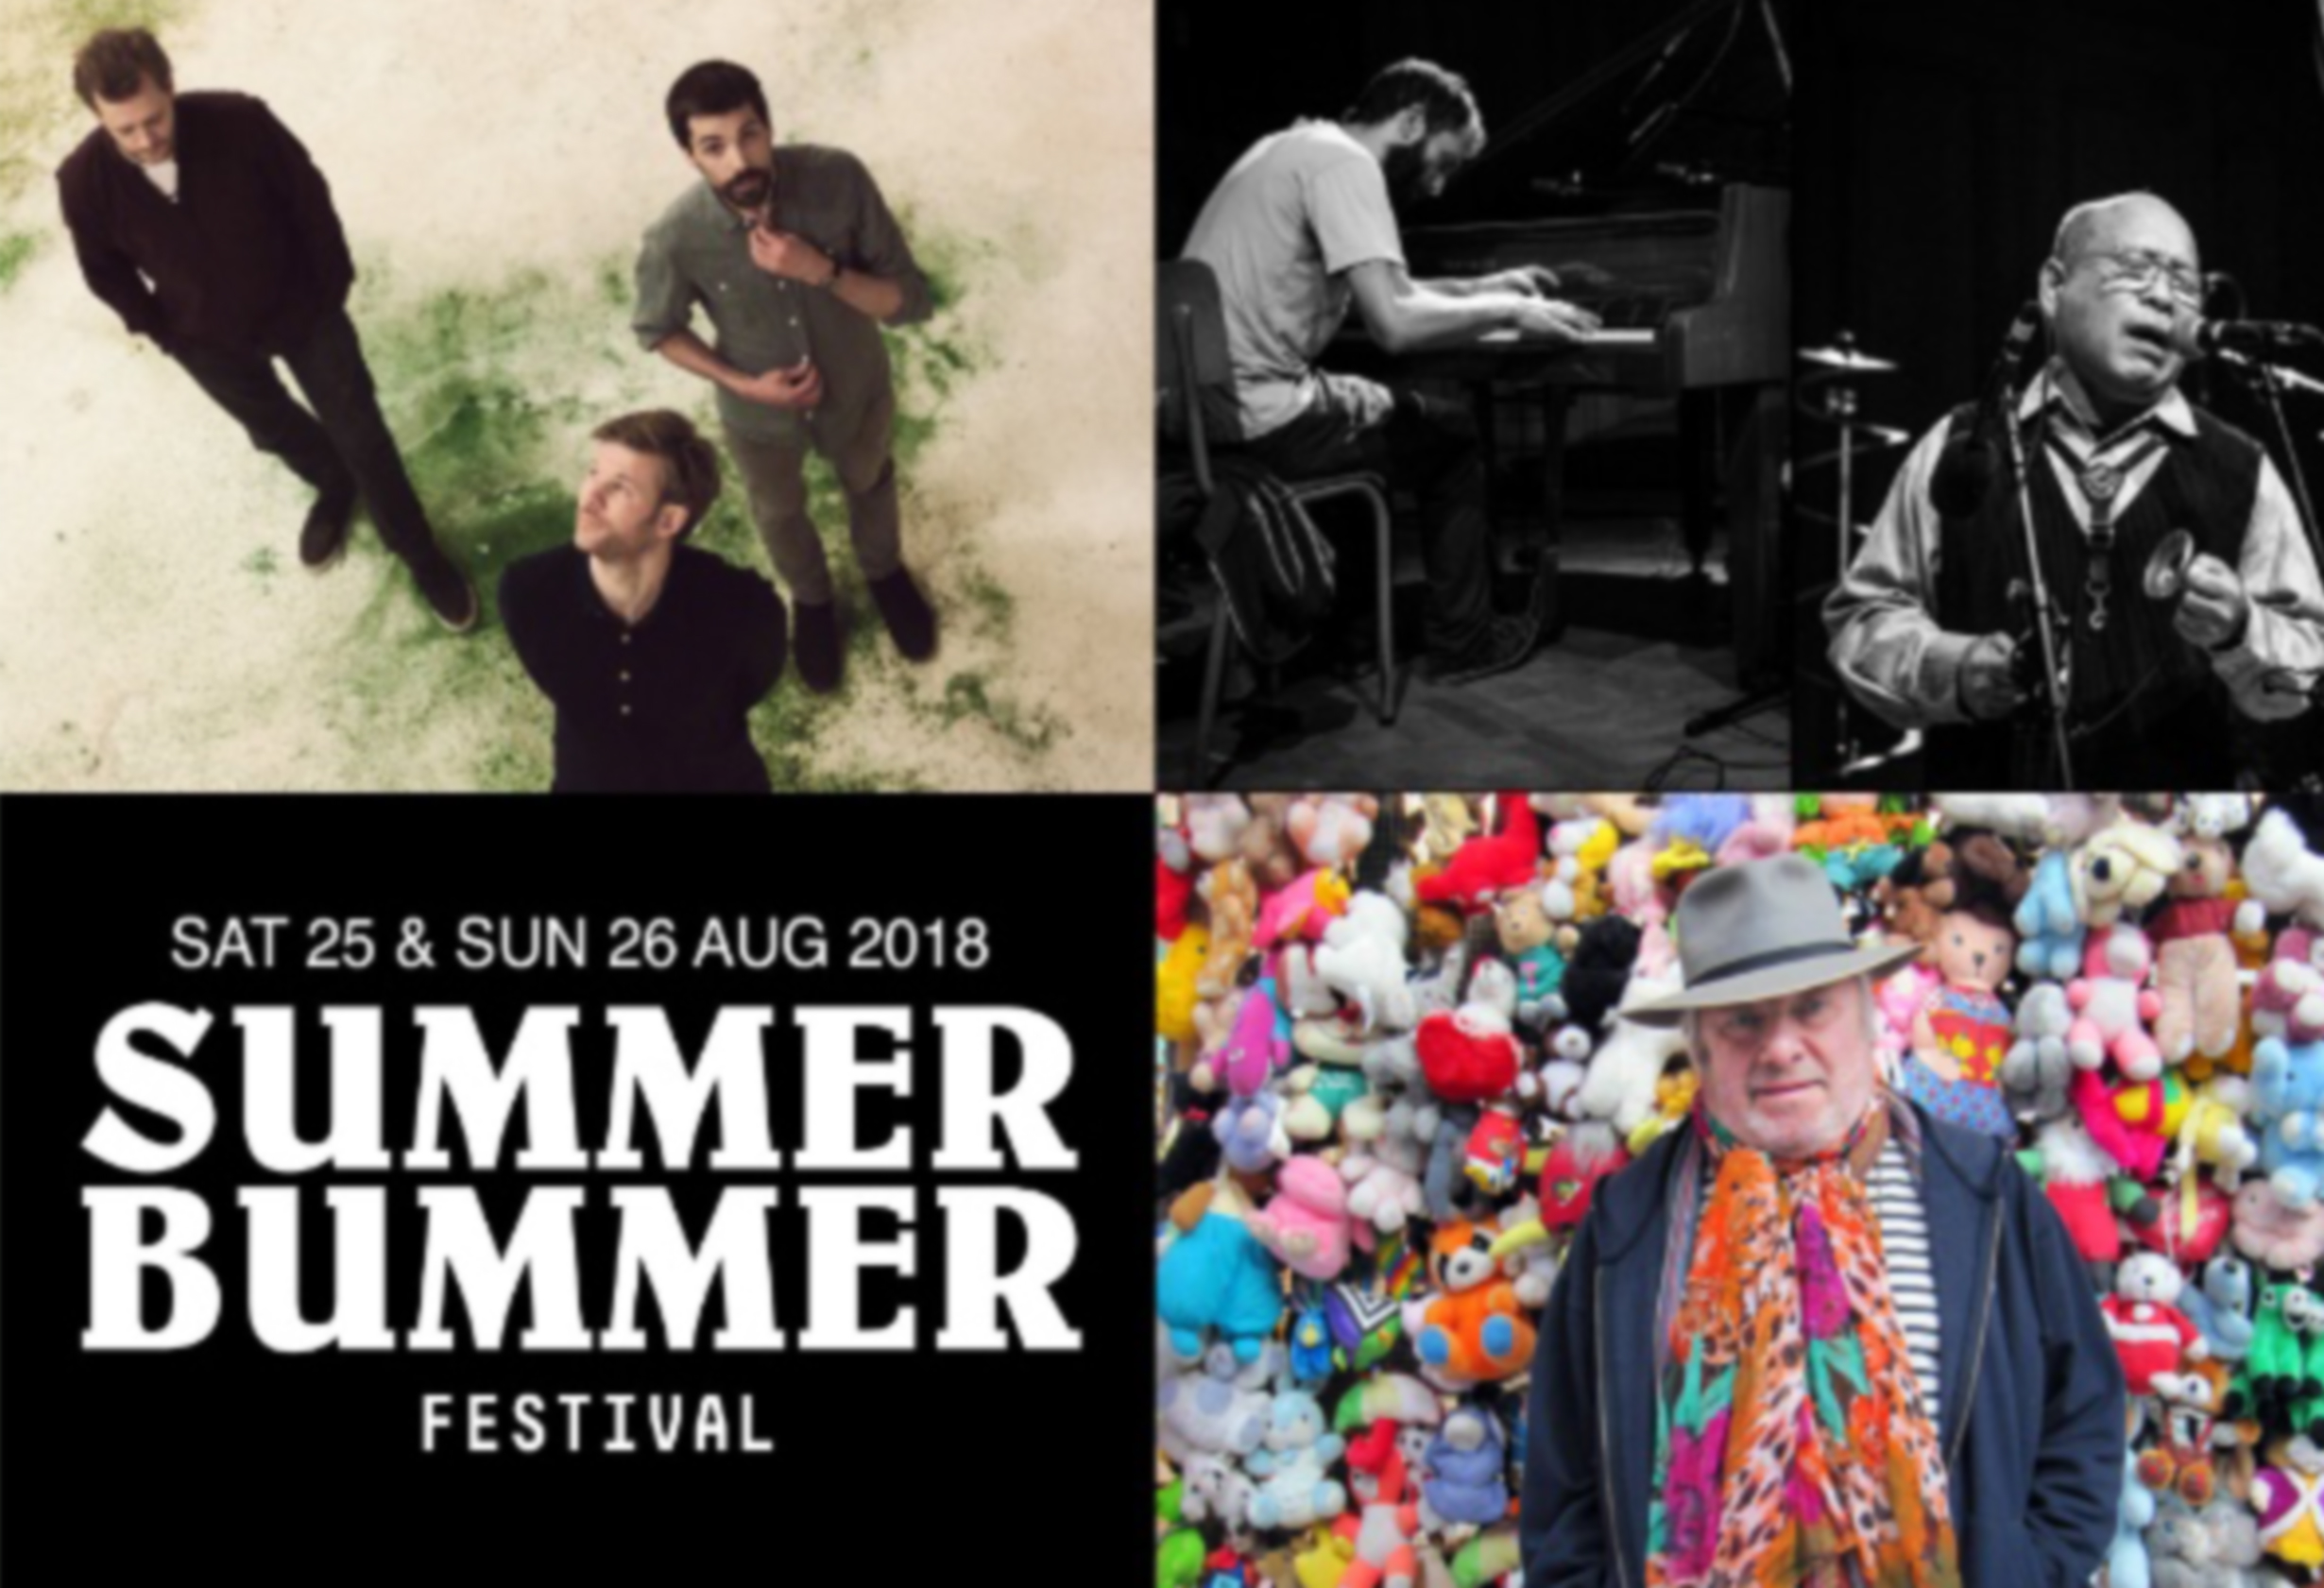 SAKATA-DI DOMENICO + CAMBIEN TRIO – AB SALON 02/5/2018 – SUMMER BUMMER FESTIVAL 25 & 26/8/2018